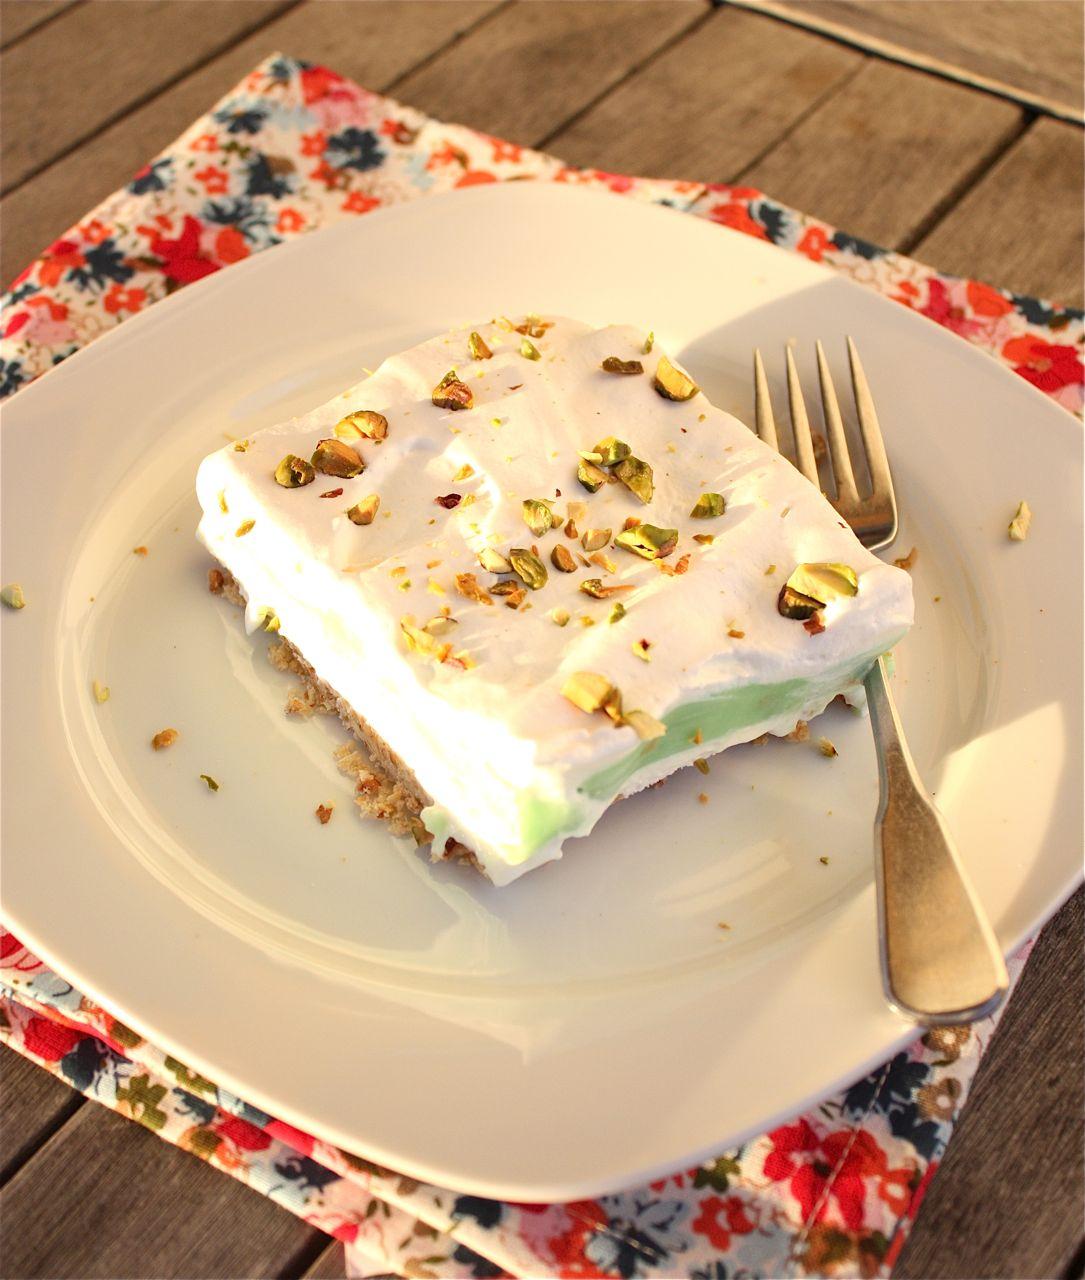 Patty's Pistachio Torte